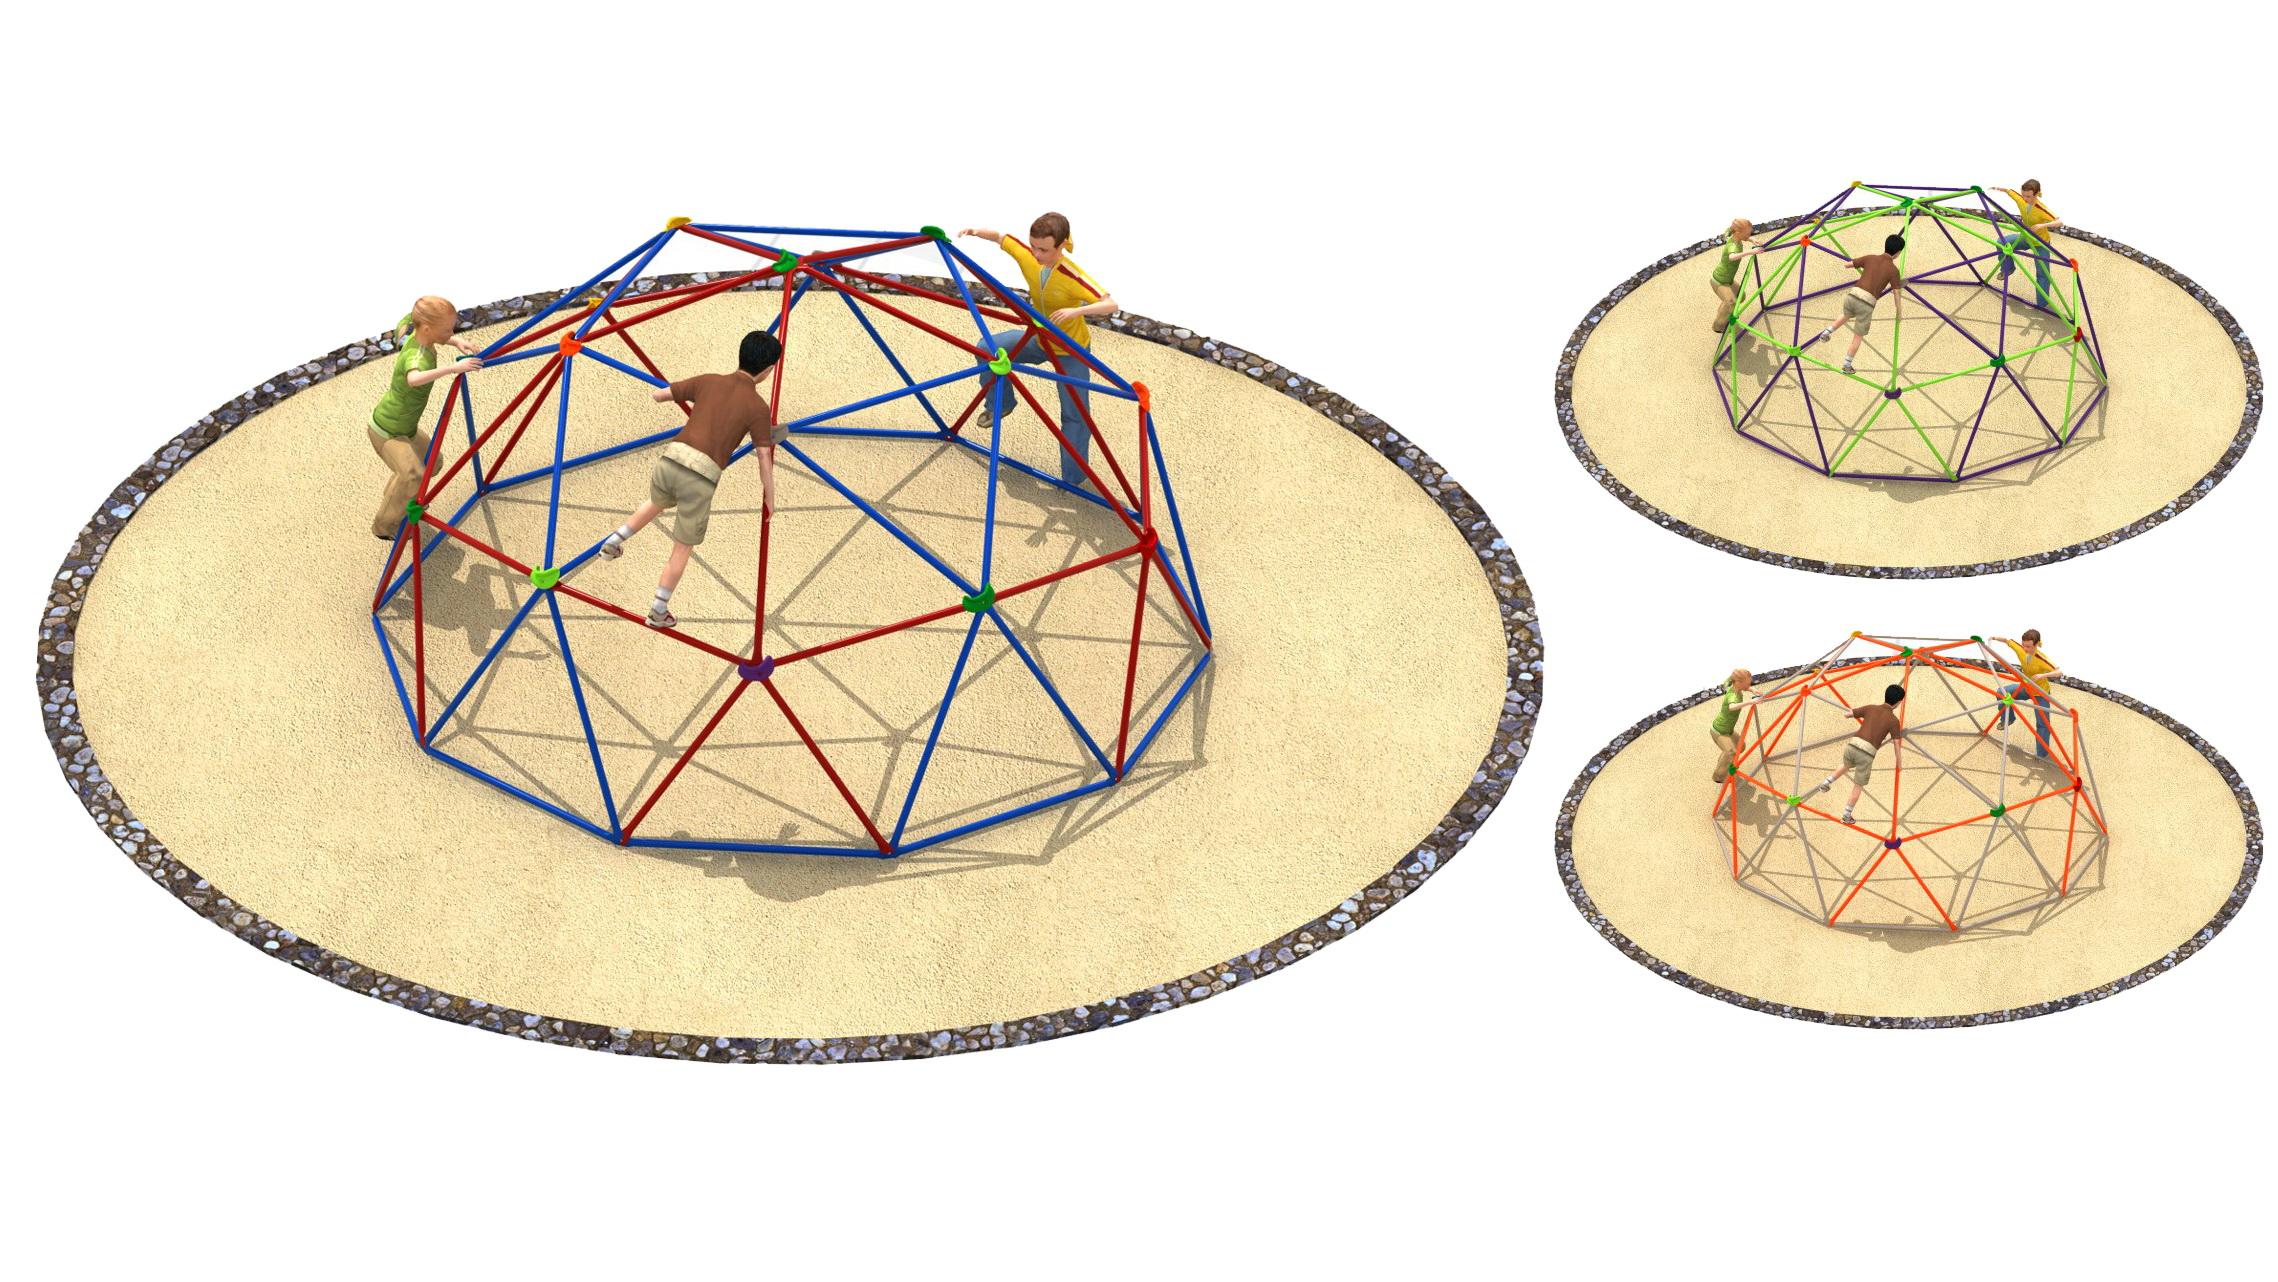 Sealplay ของเล่นสนาม ปีนป่าย ลูกโลกปีนป่าย